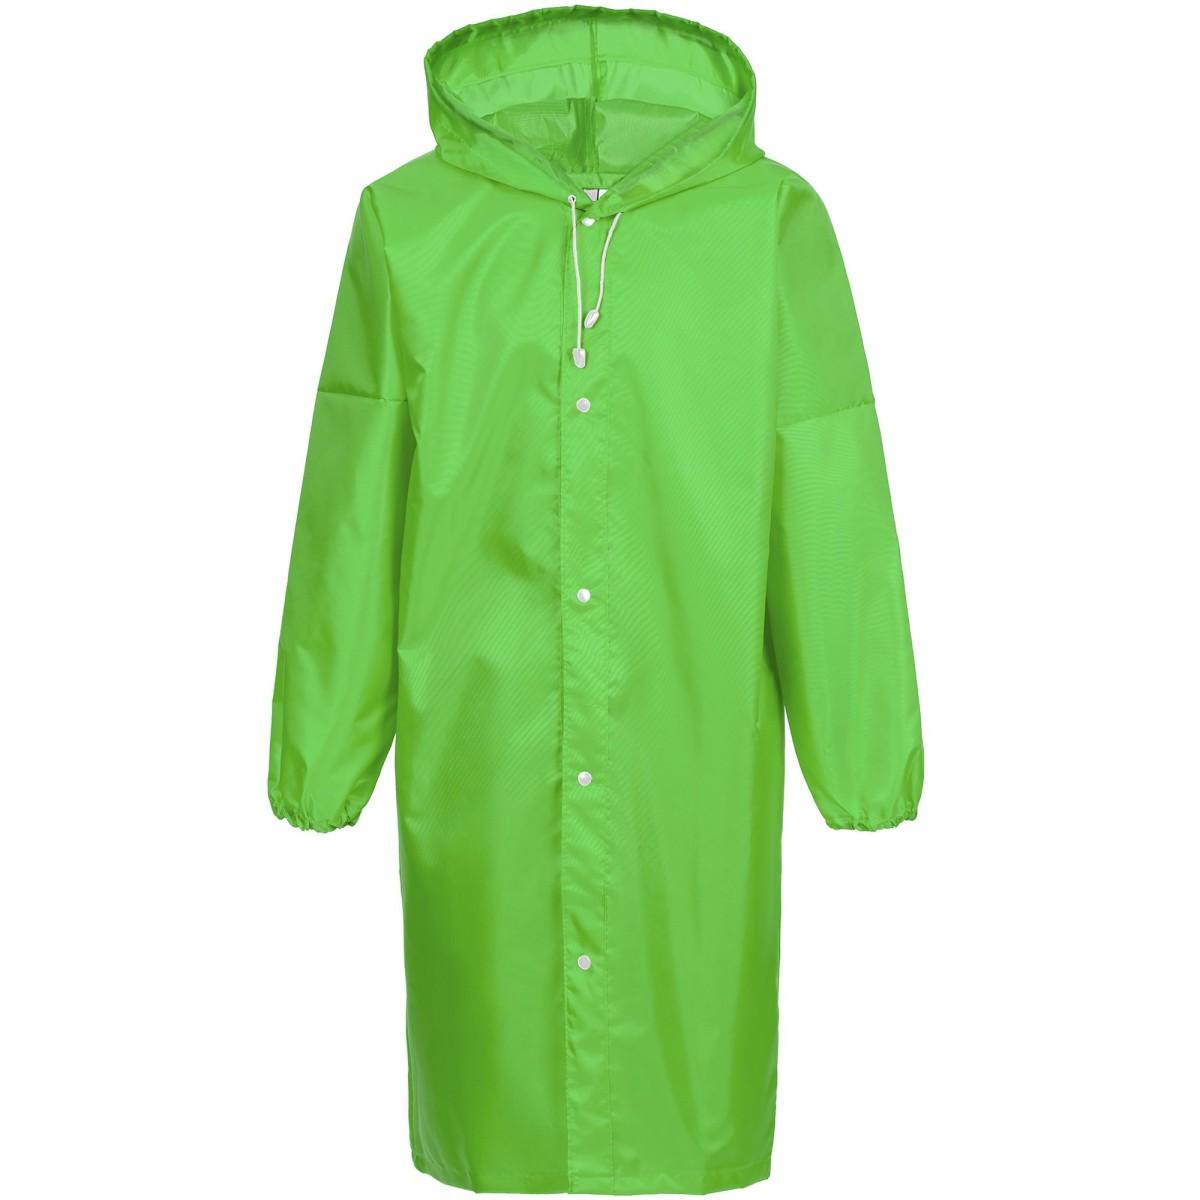 Дождевик Rainman Strong Зеленый S